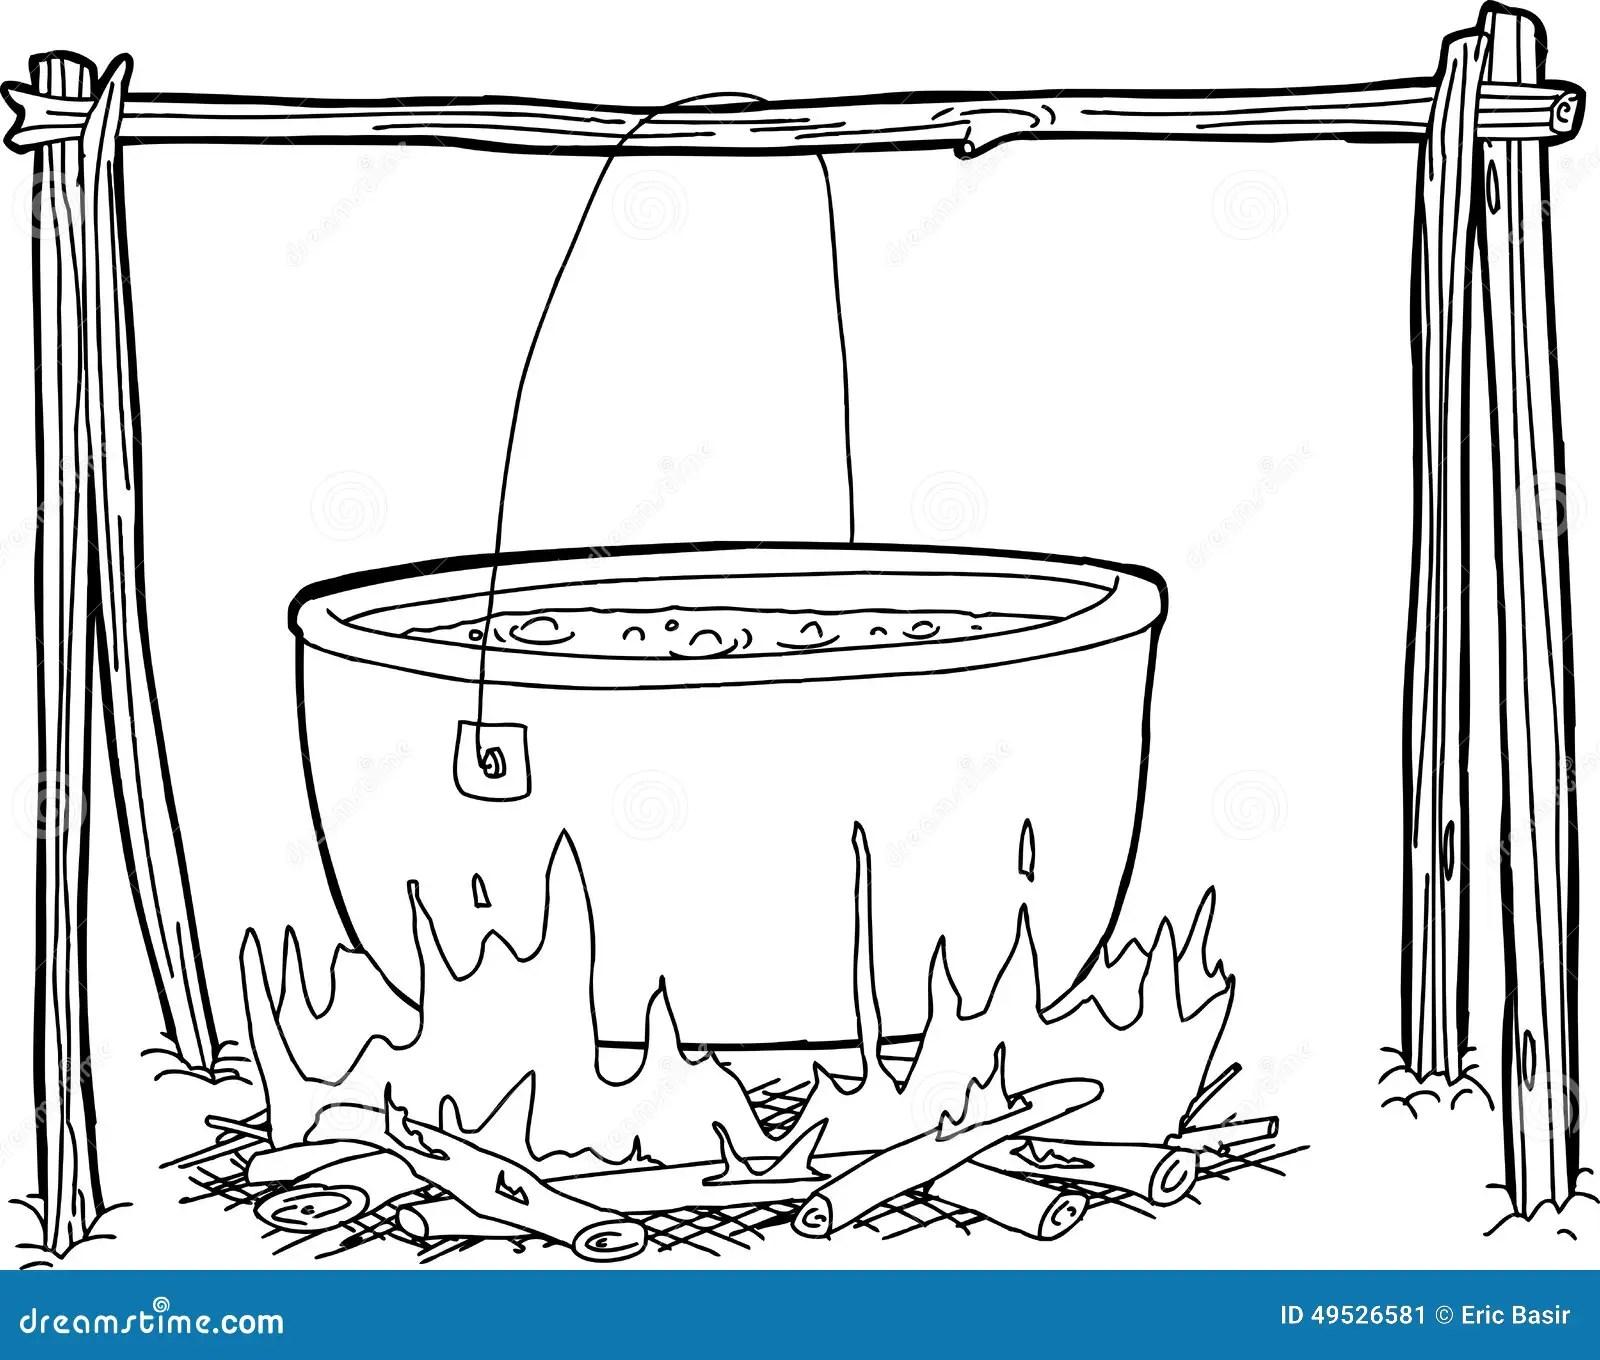 Outline Of Kettle Over Campfire Stock Illustration